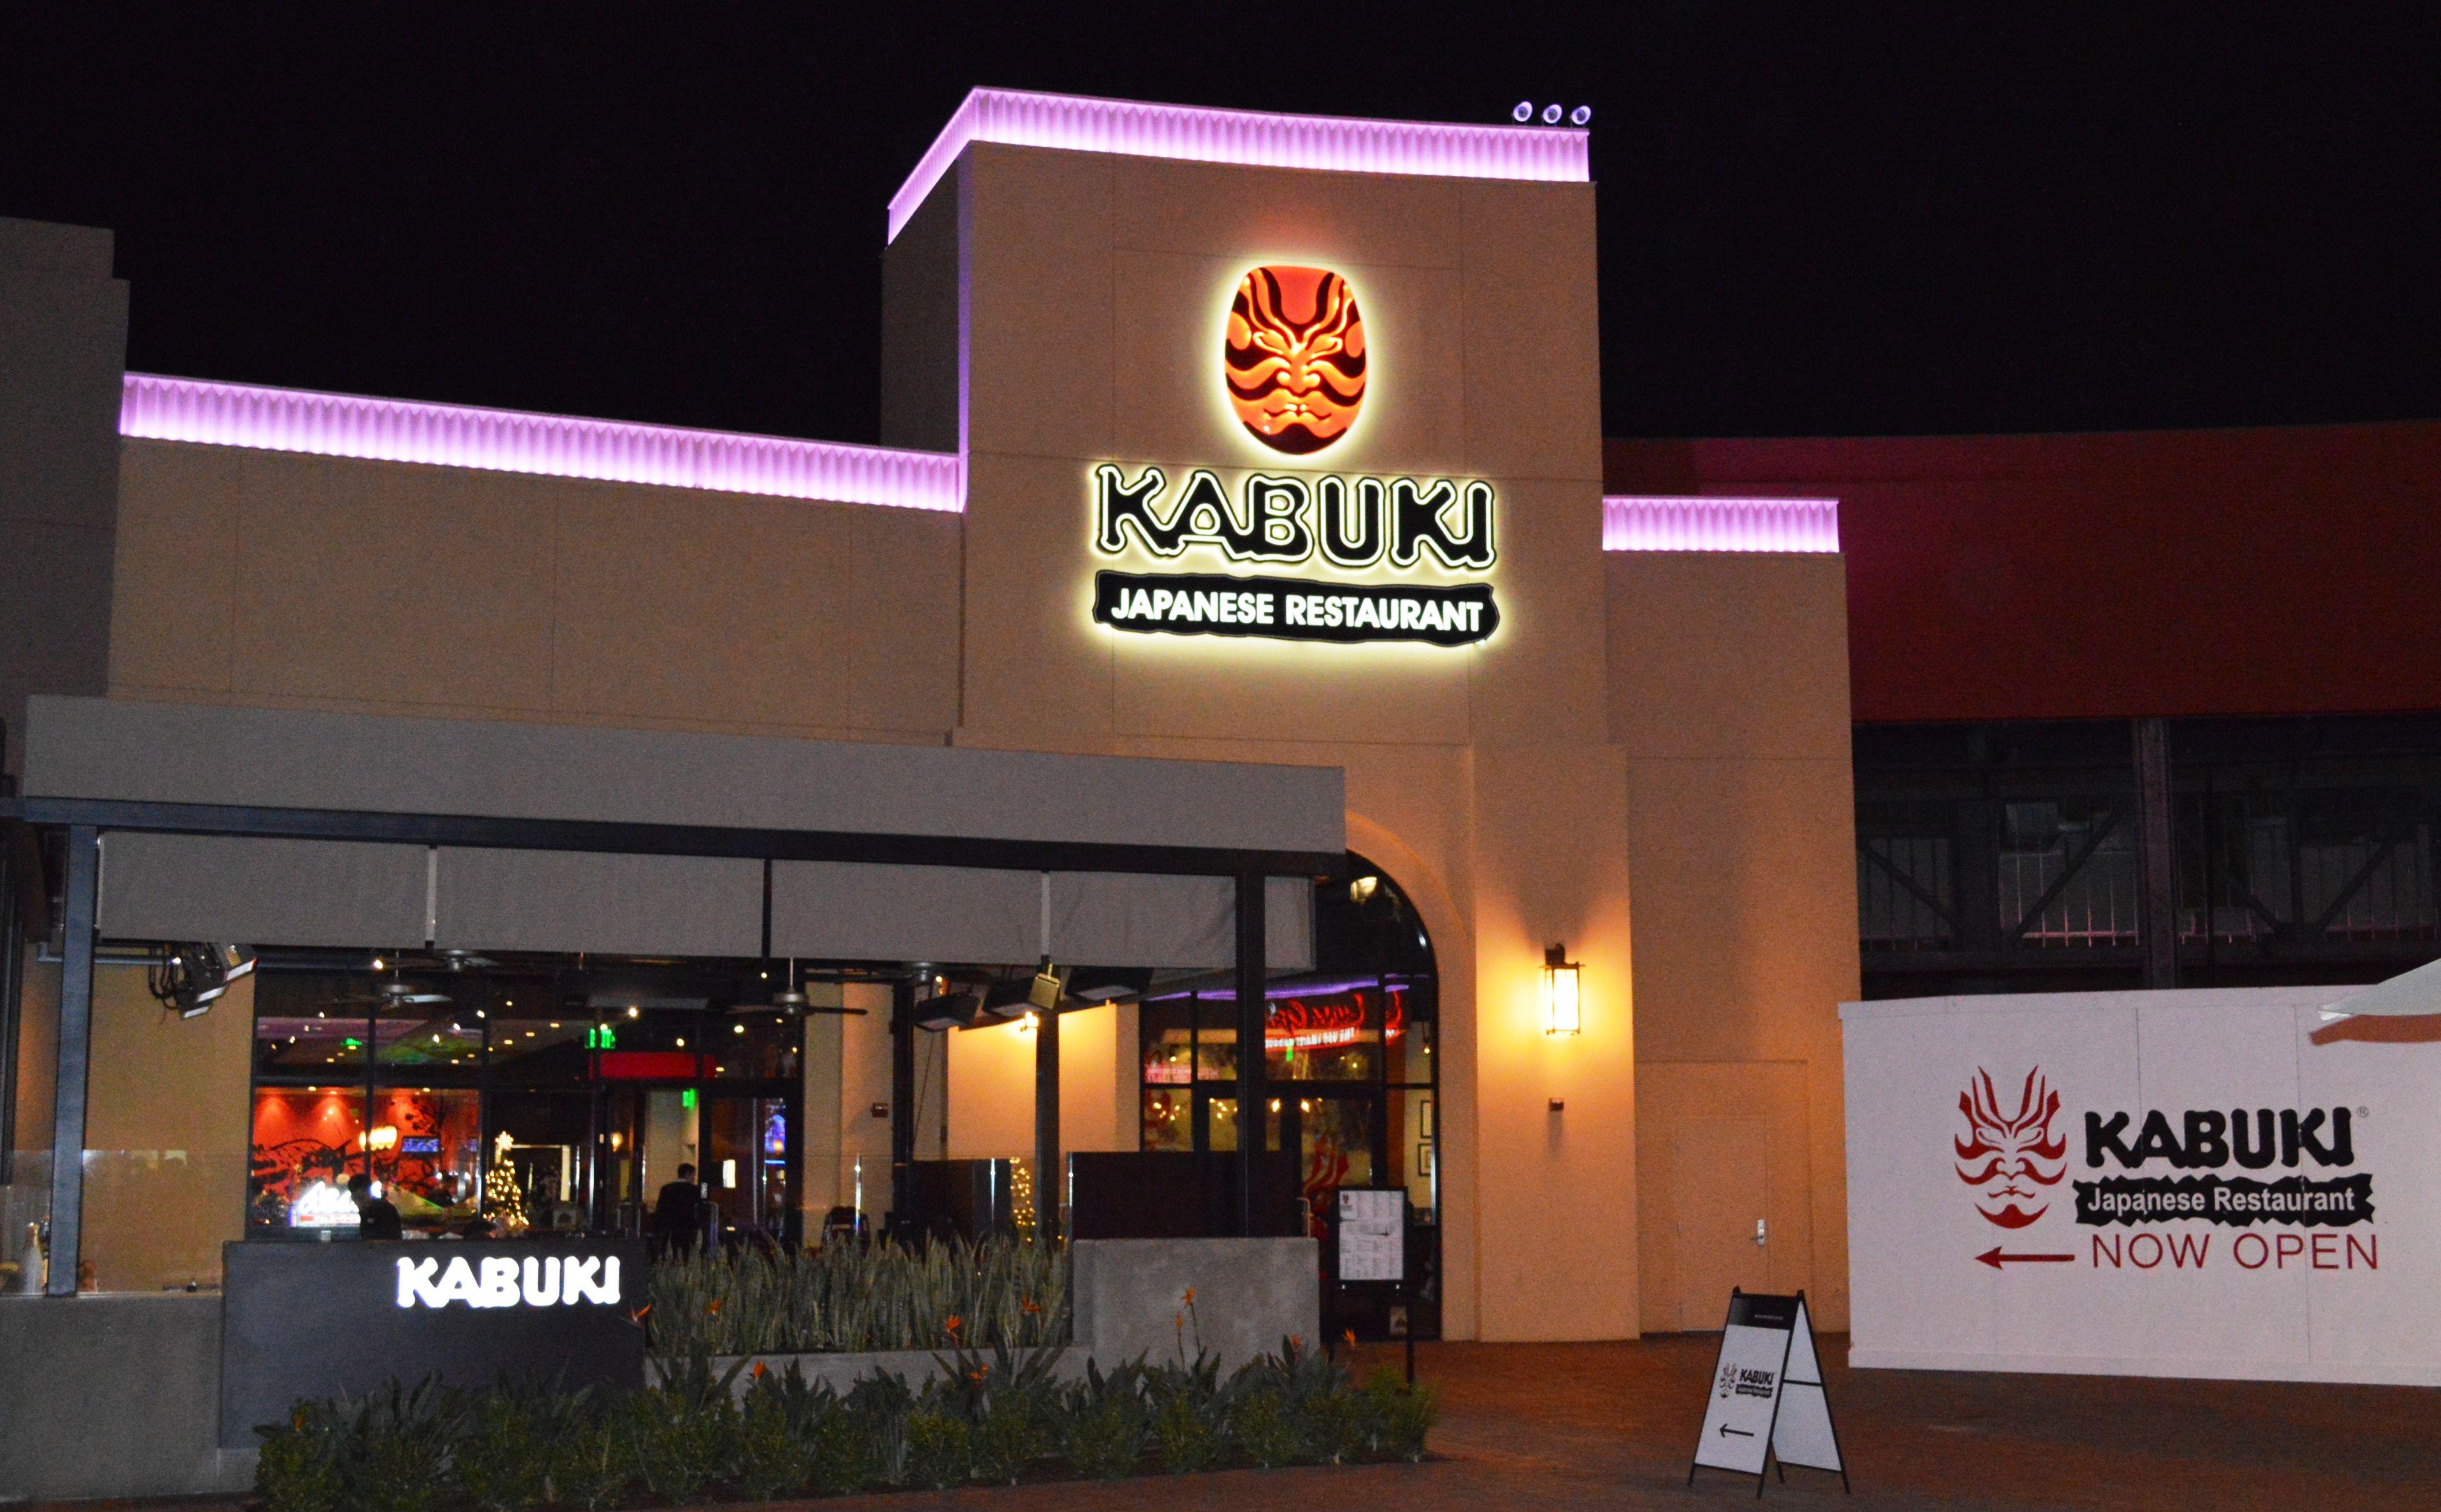 Kabuki Anese Restaurant Irvine Spectrum Center Places Ive Been